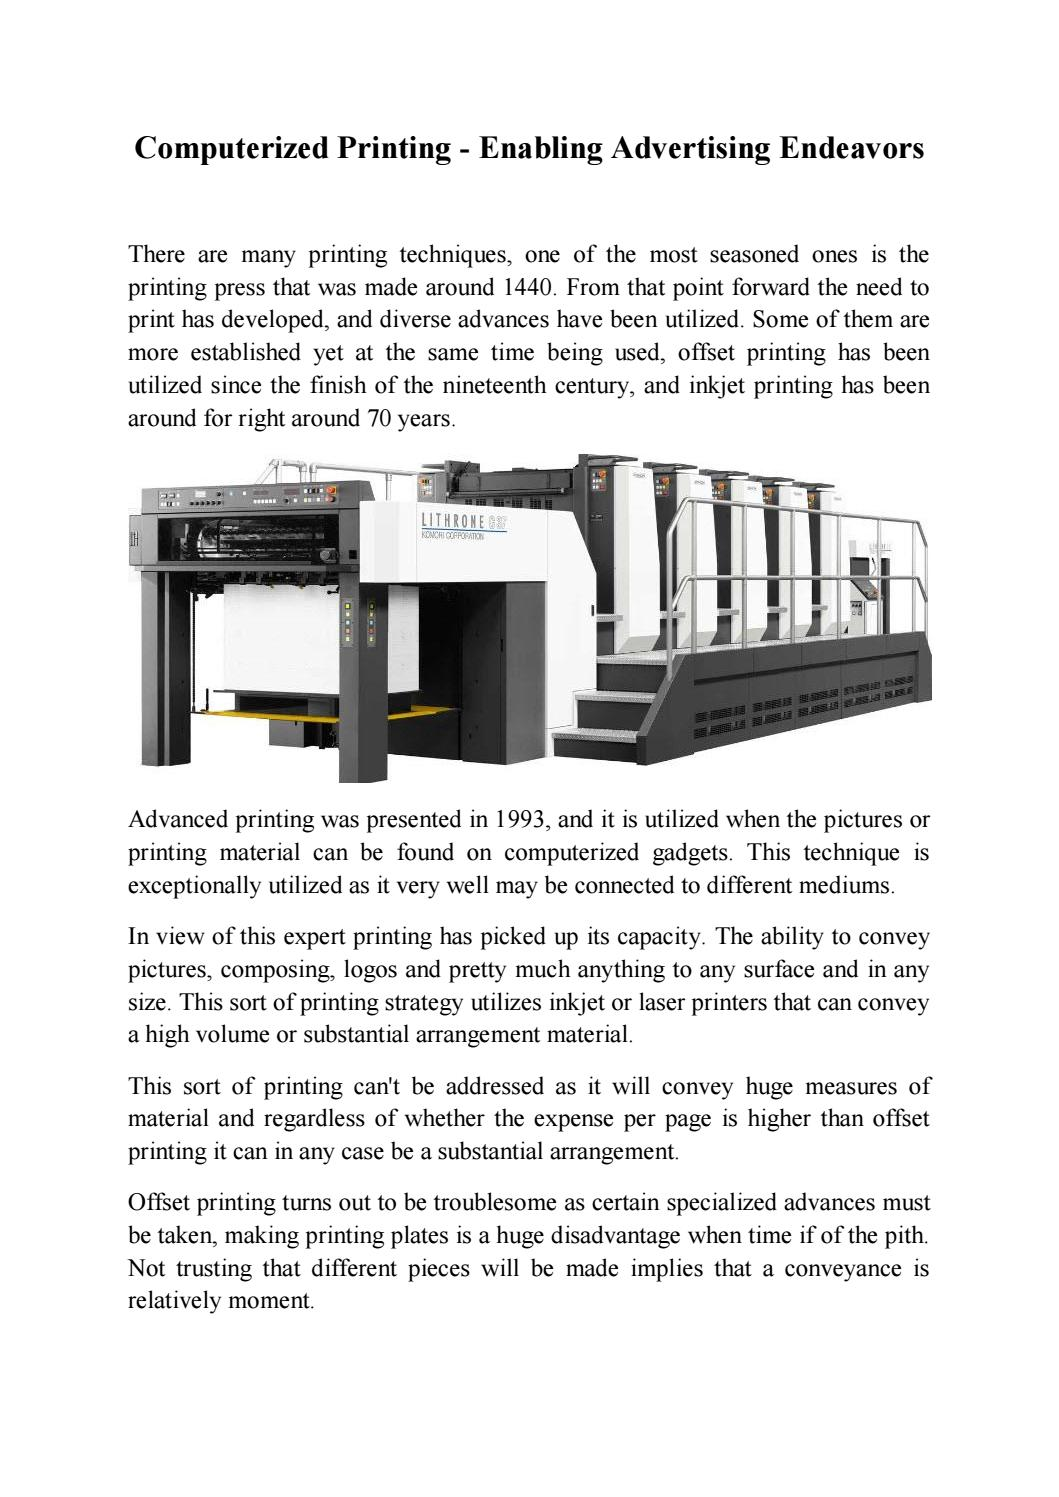 Computerized Printing - Enabling Advertising Endeavors by